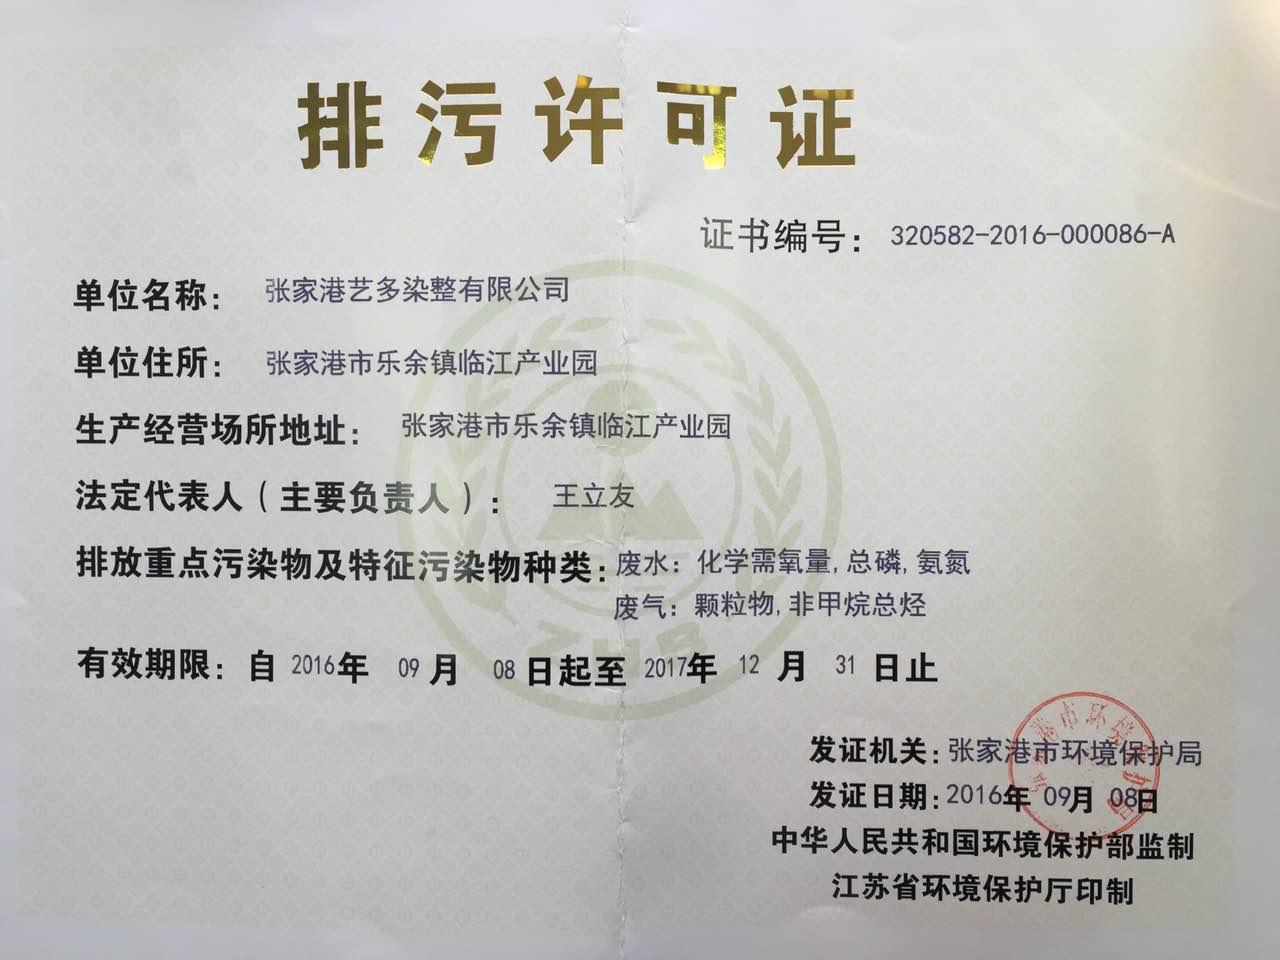 Emission Permits